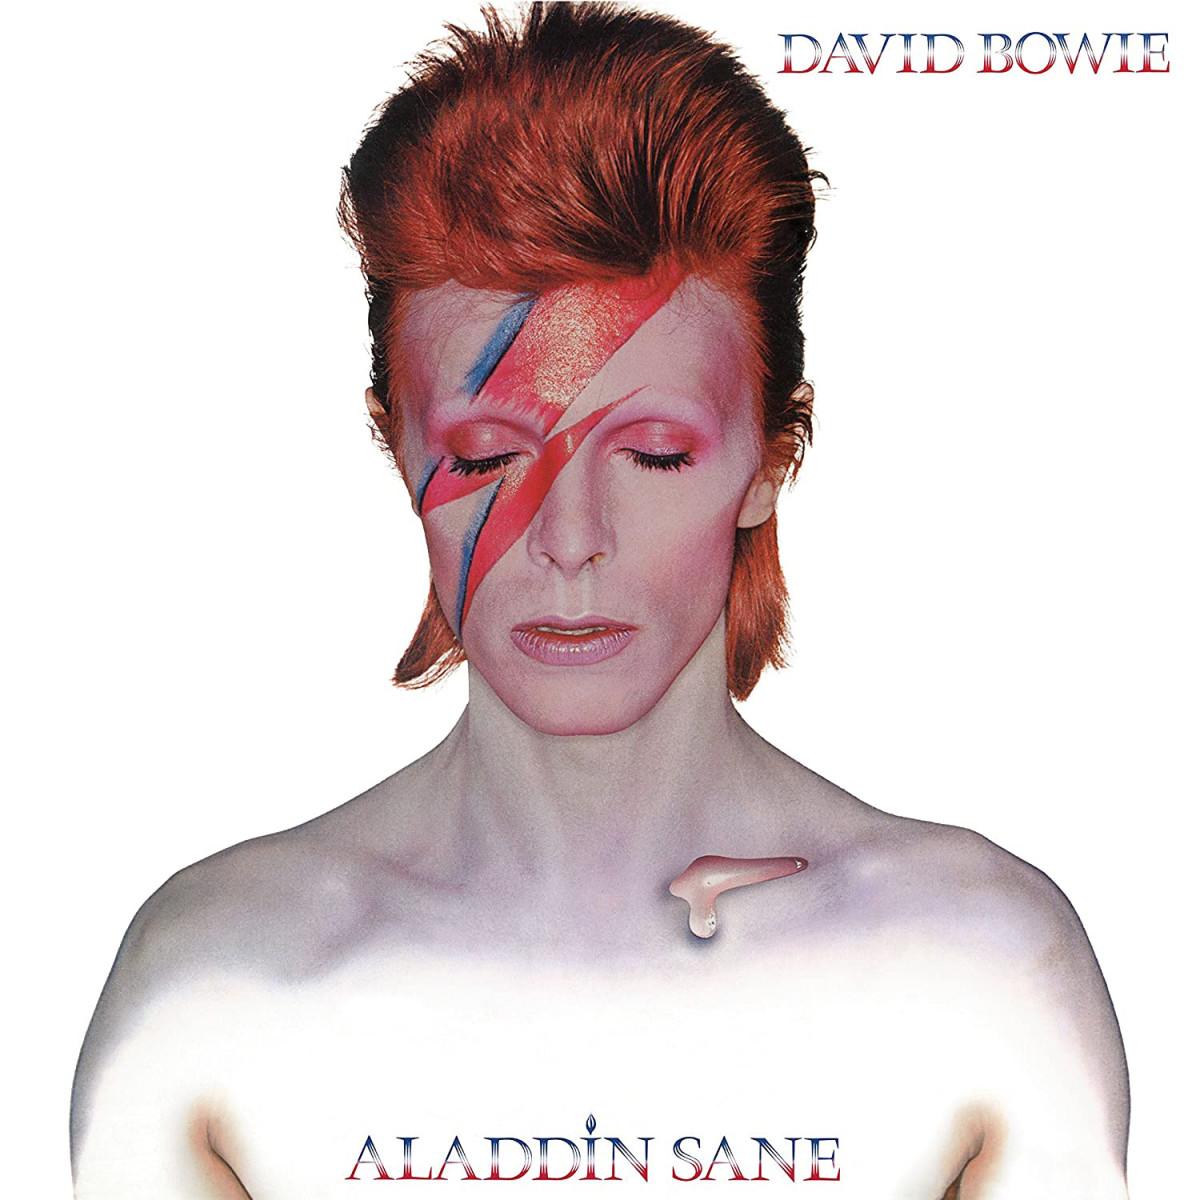 David Bowie, Aladdin Sane